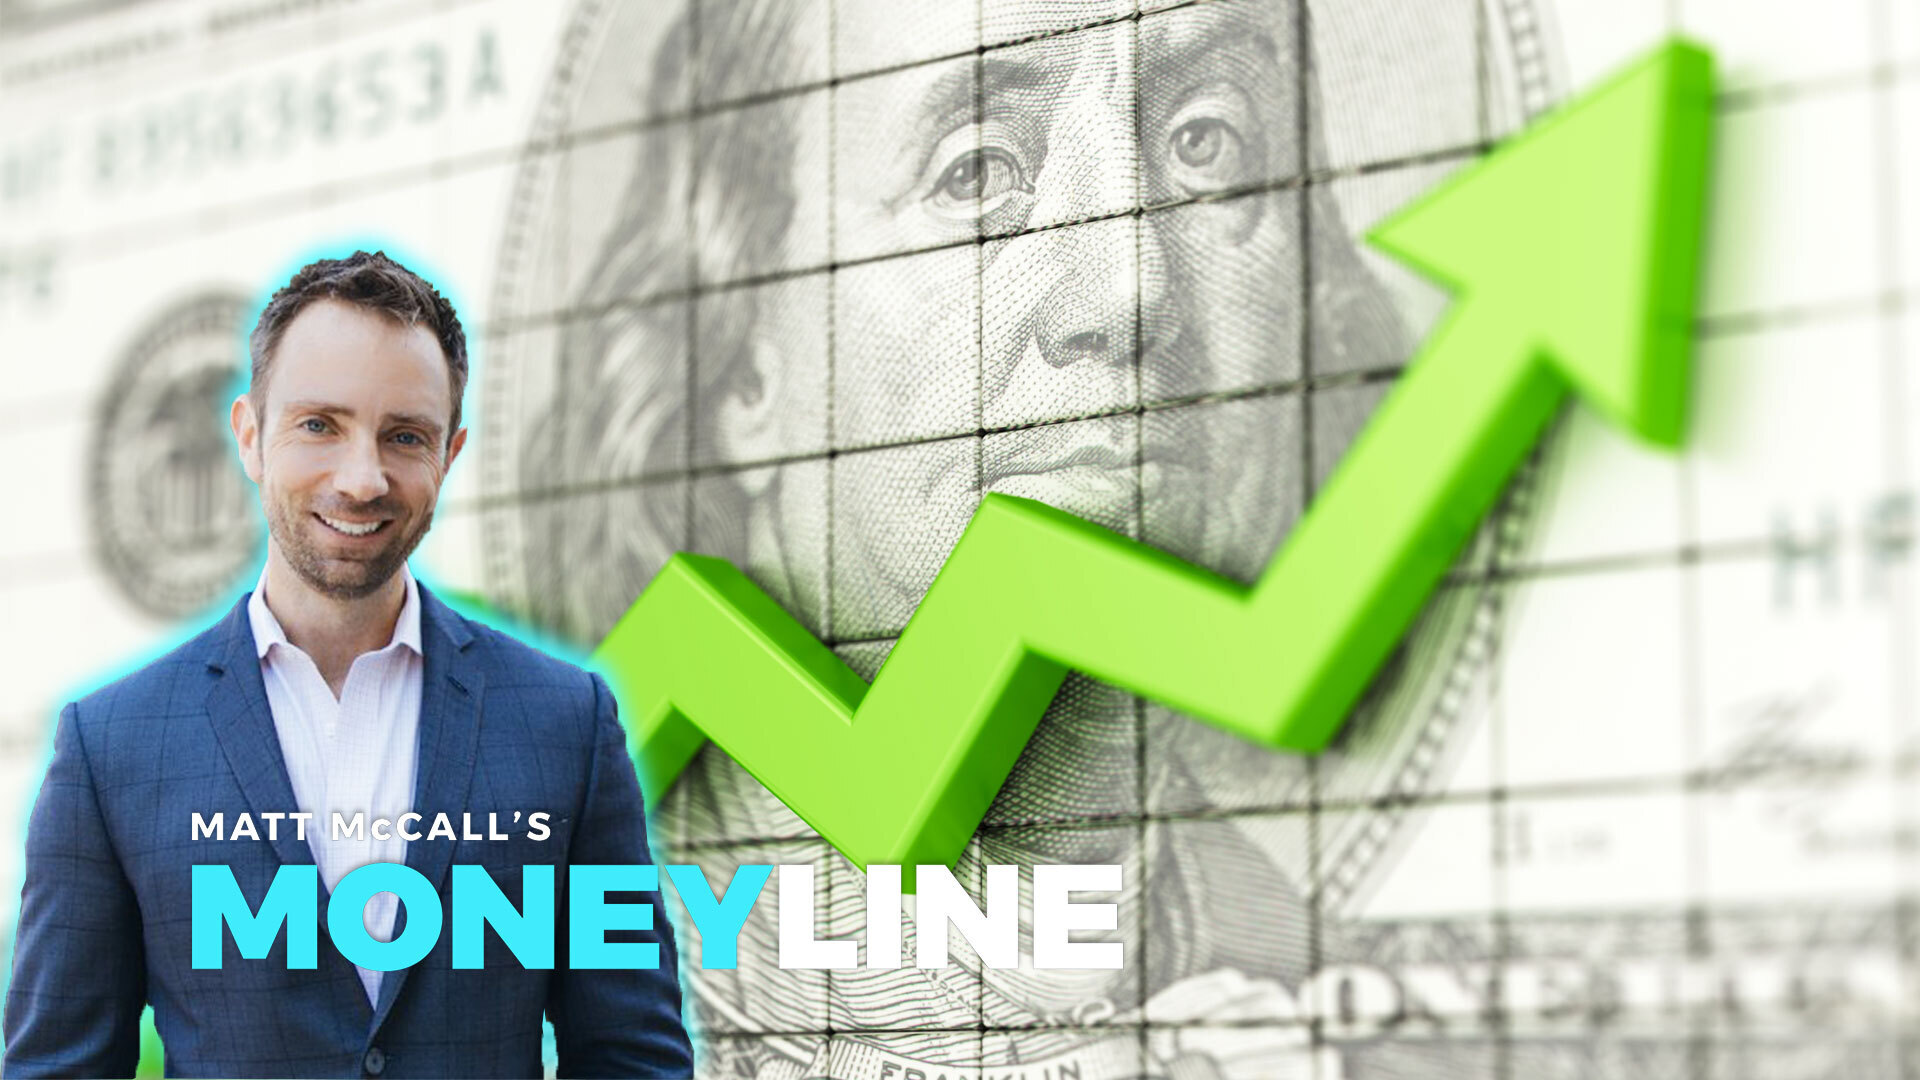 Matt McCall's Moneyline: 10 Stocks That Just Might Be Good Investments